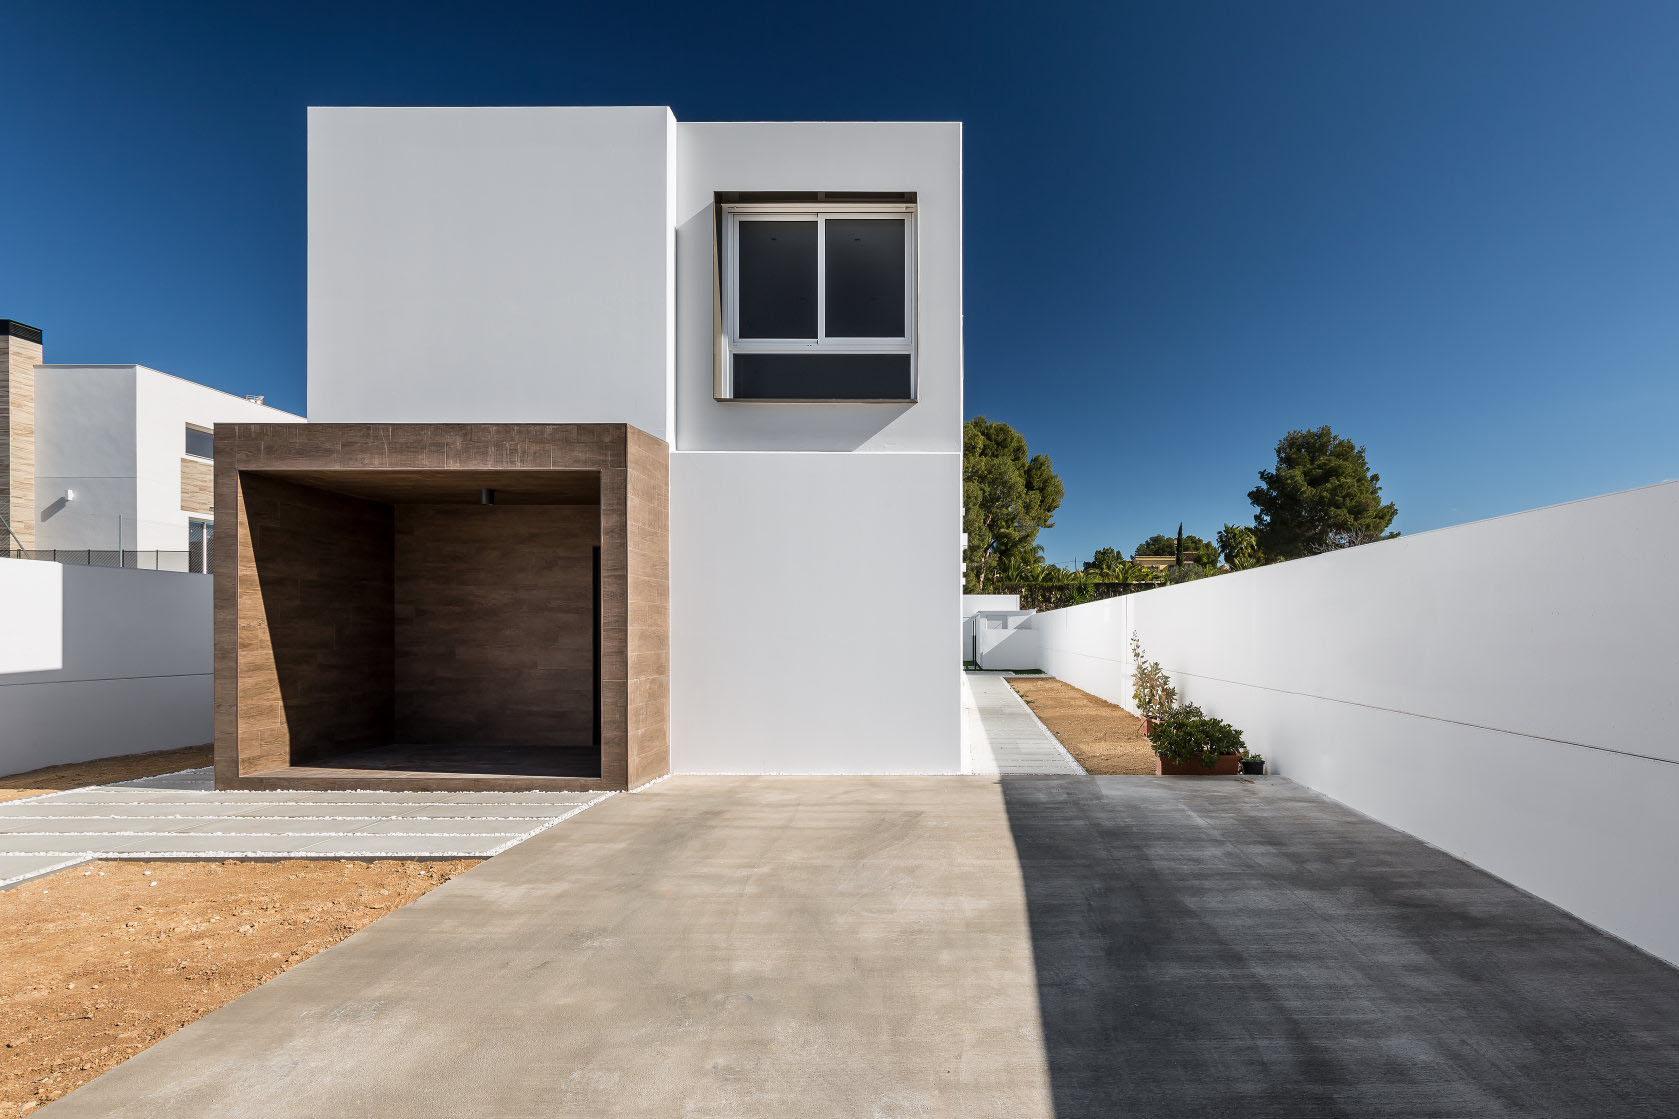 fotografia-arquitectura-valencia-german-cabo-viraje-san-antonio (x)_portada